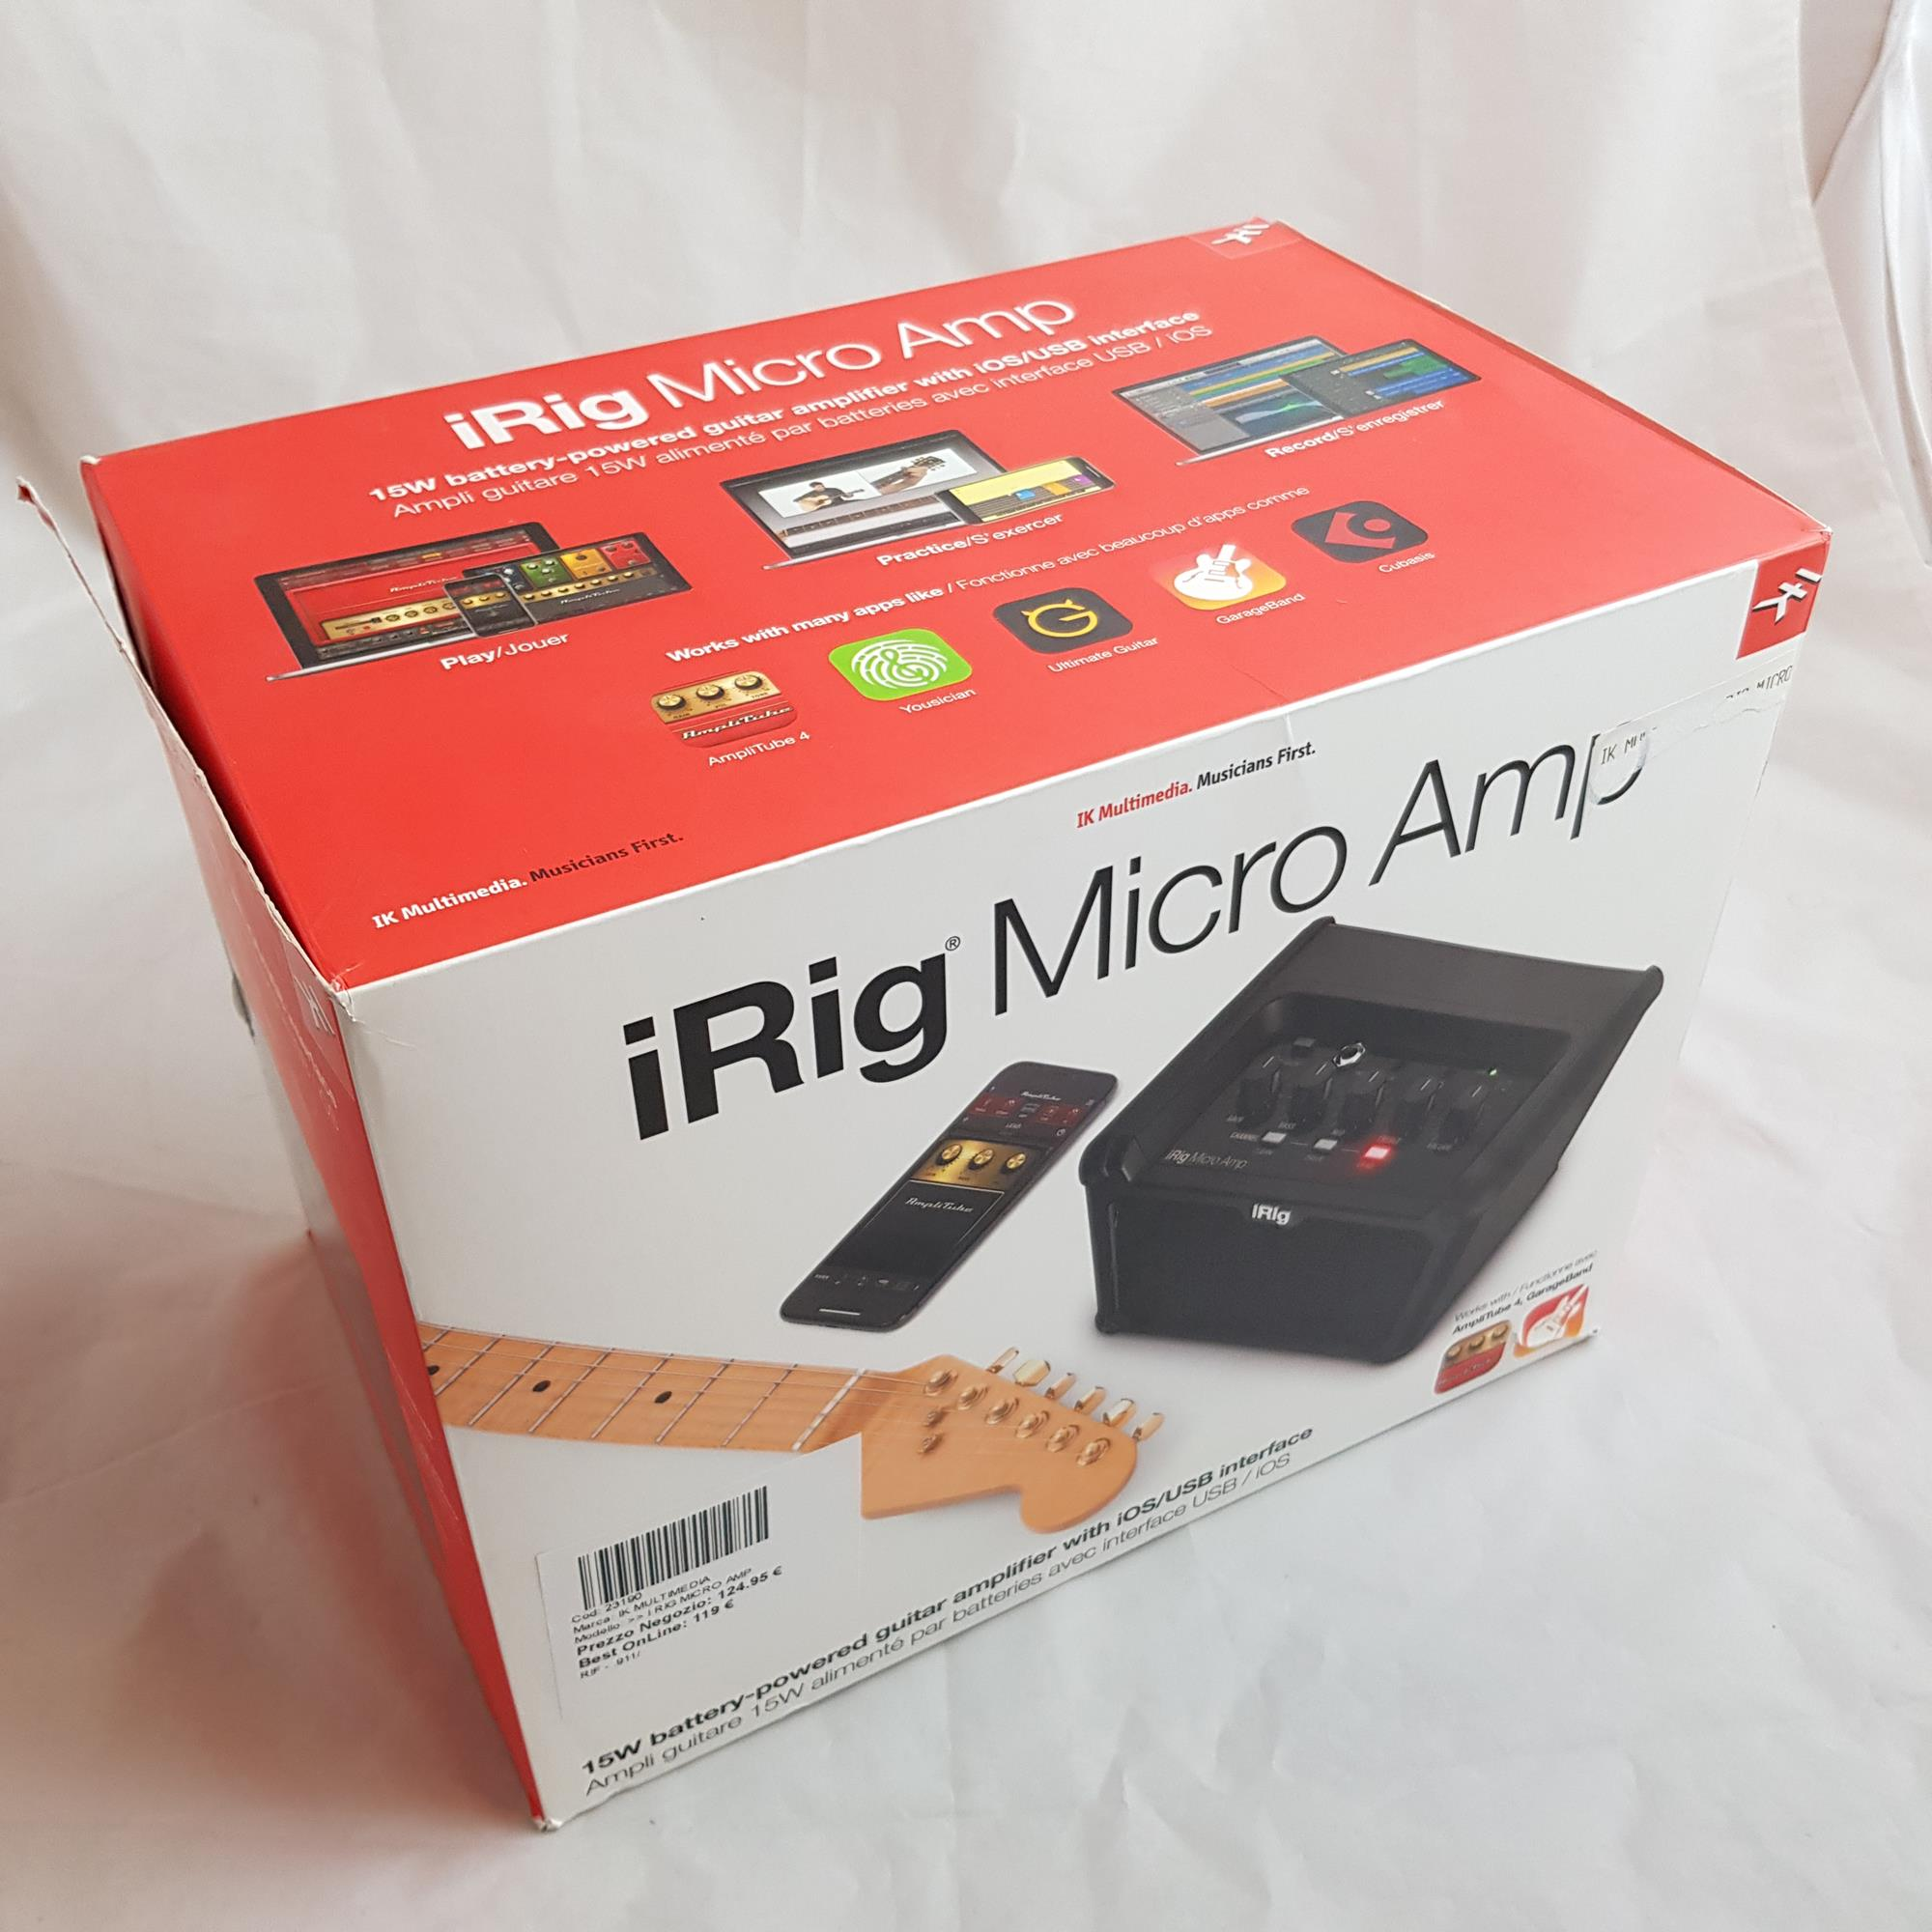 IK-MULTIMEDIA-I-RIG-MICRO-AMP-sku-1589020535478